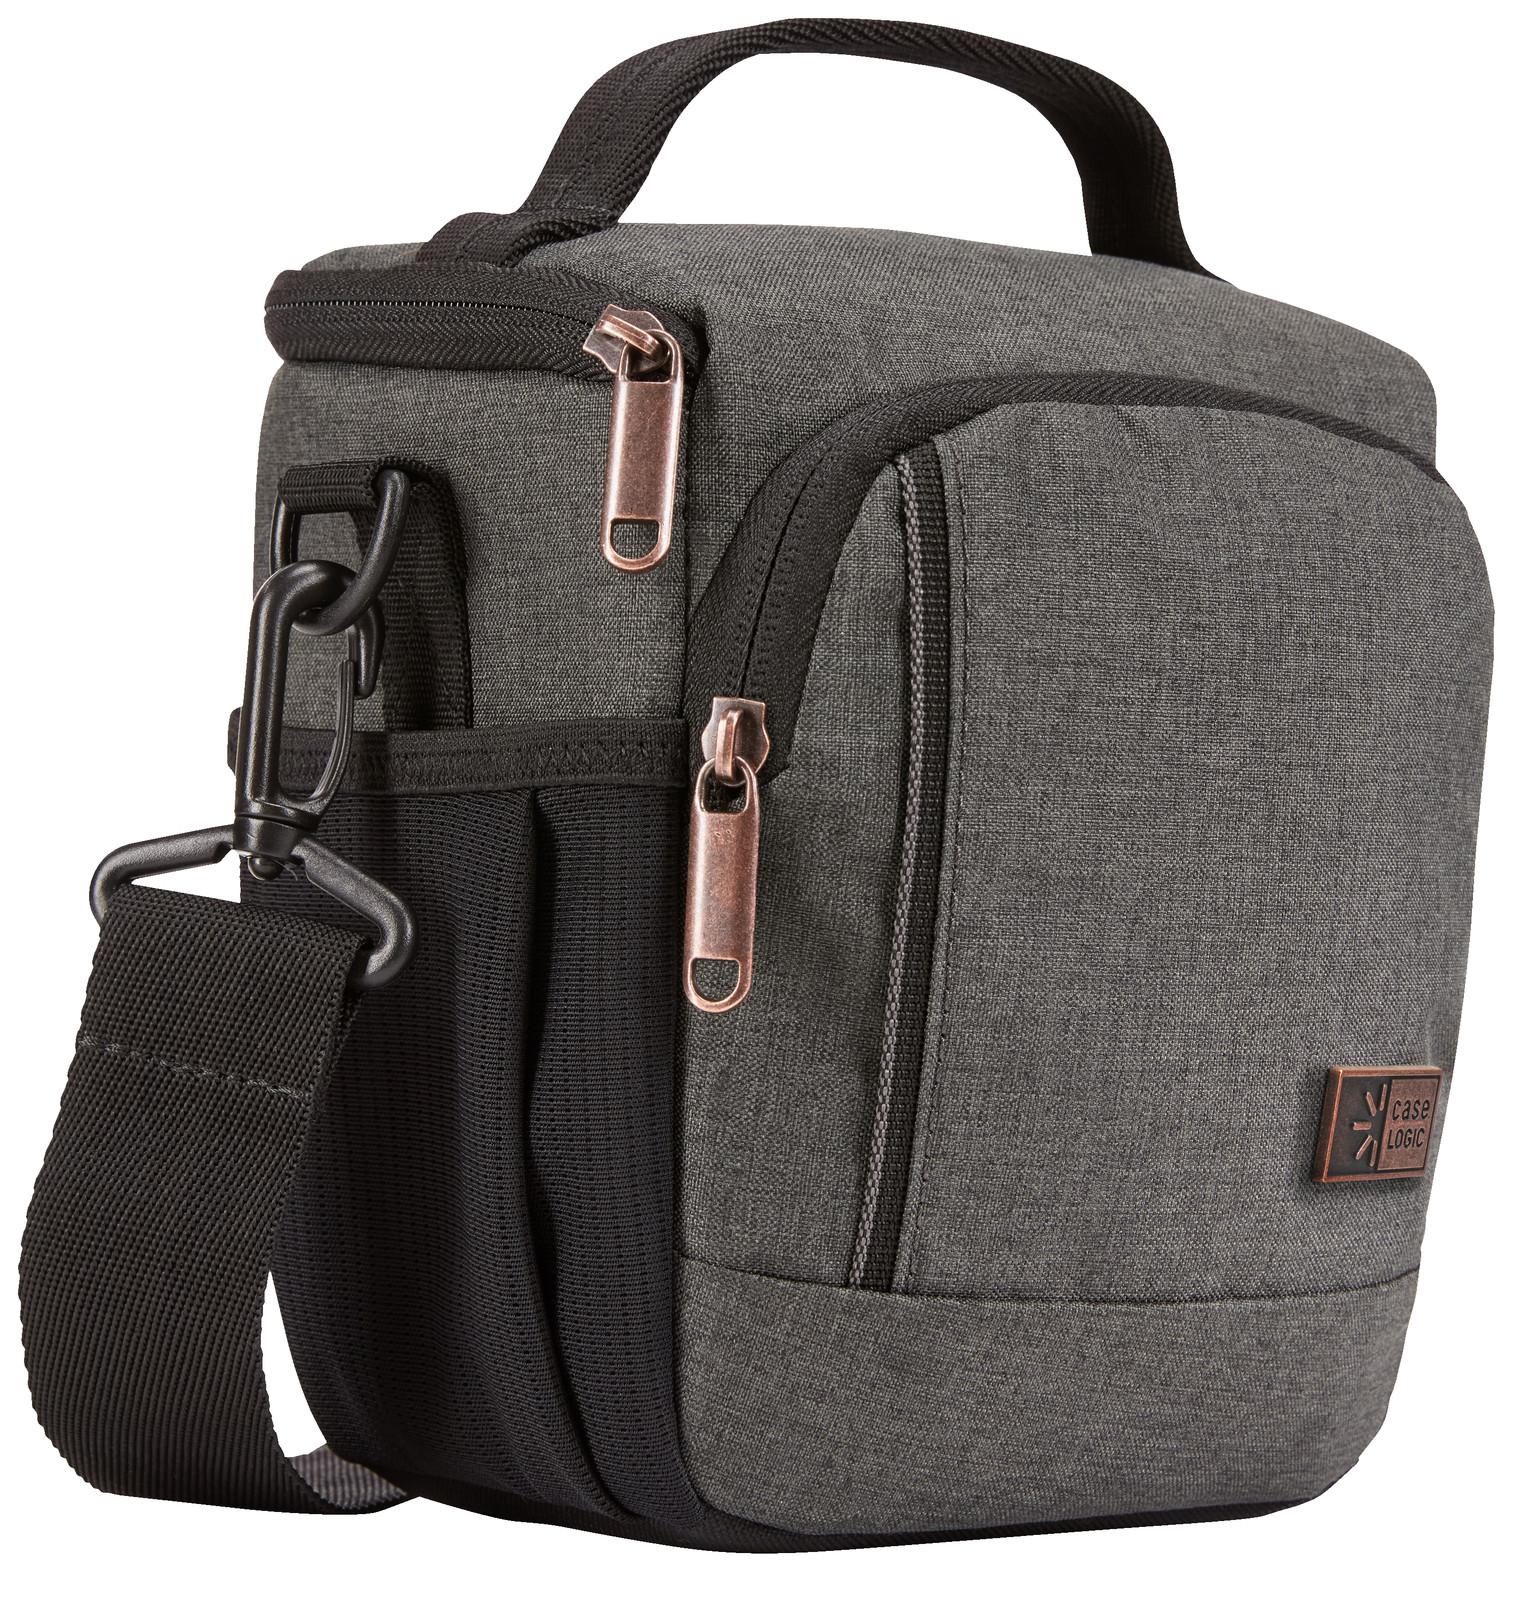 Waterproof Mirrorless Kameraobjektiv Taschen Padded Carry 2018 Case Pouchte B2M1